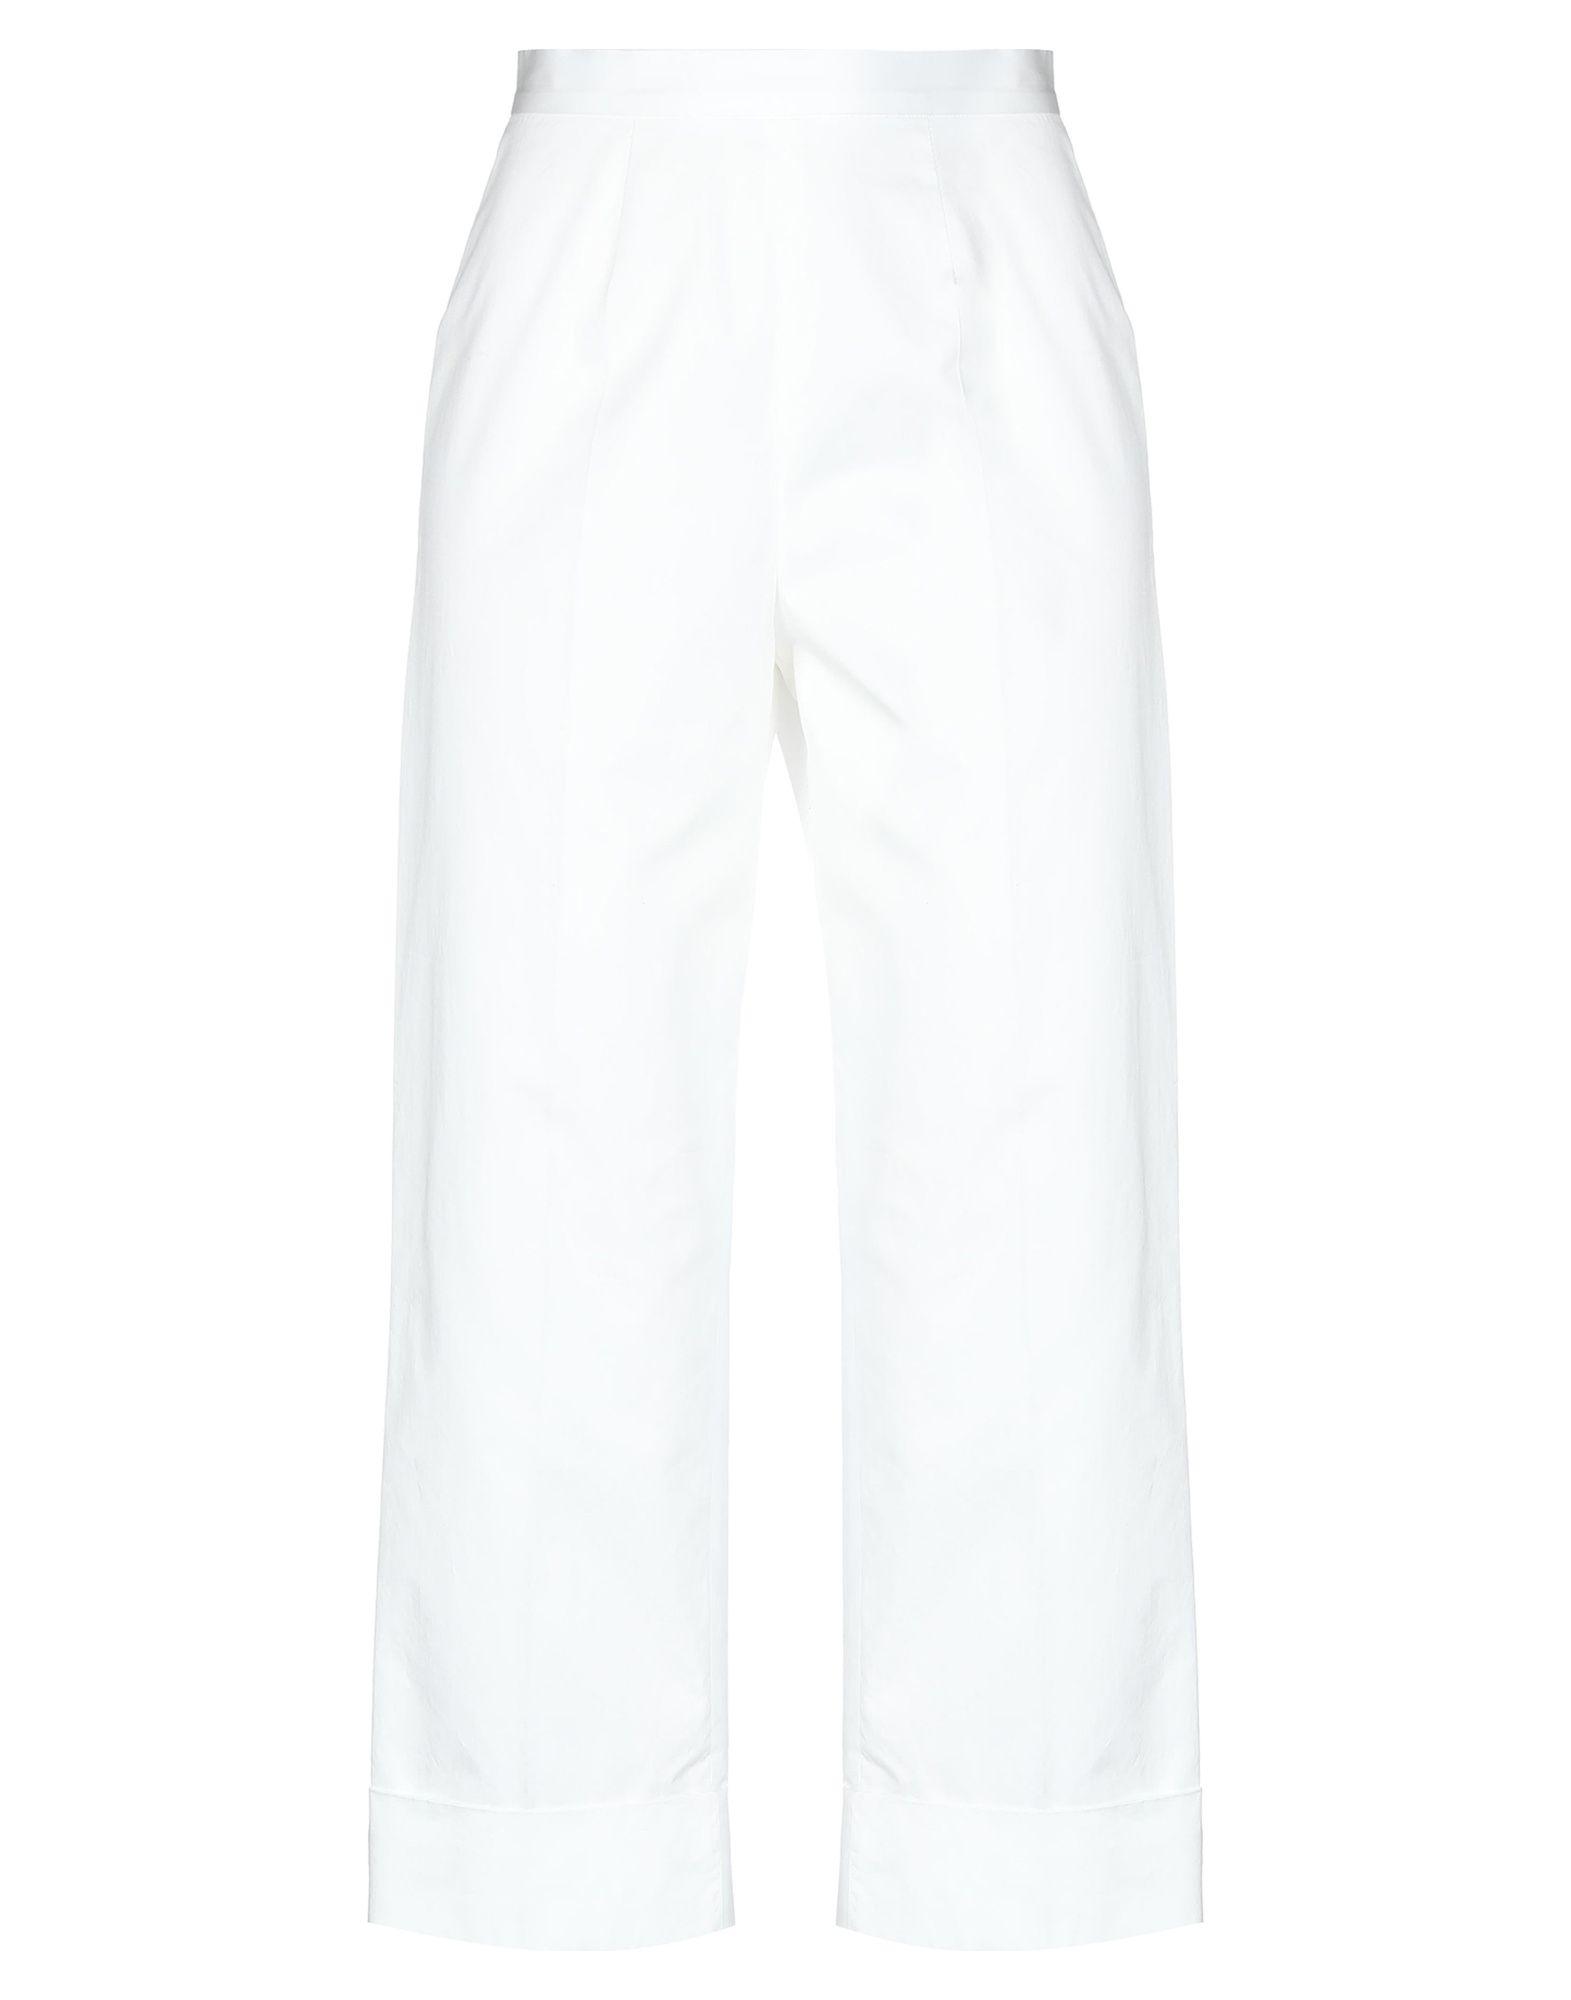 Фото - JEAN PAUL GAULTIER Повседневные брюки jean paul gaultier le male